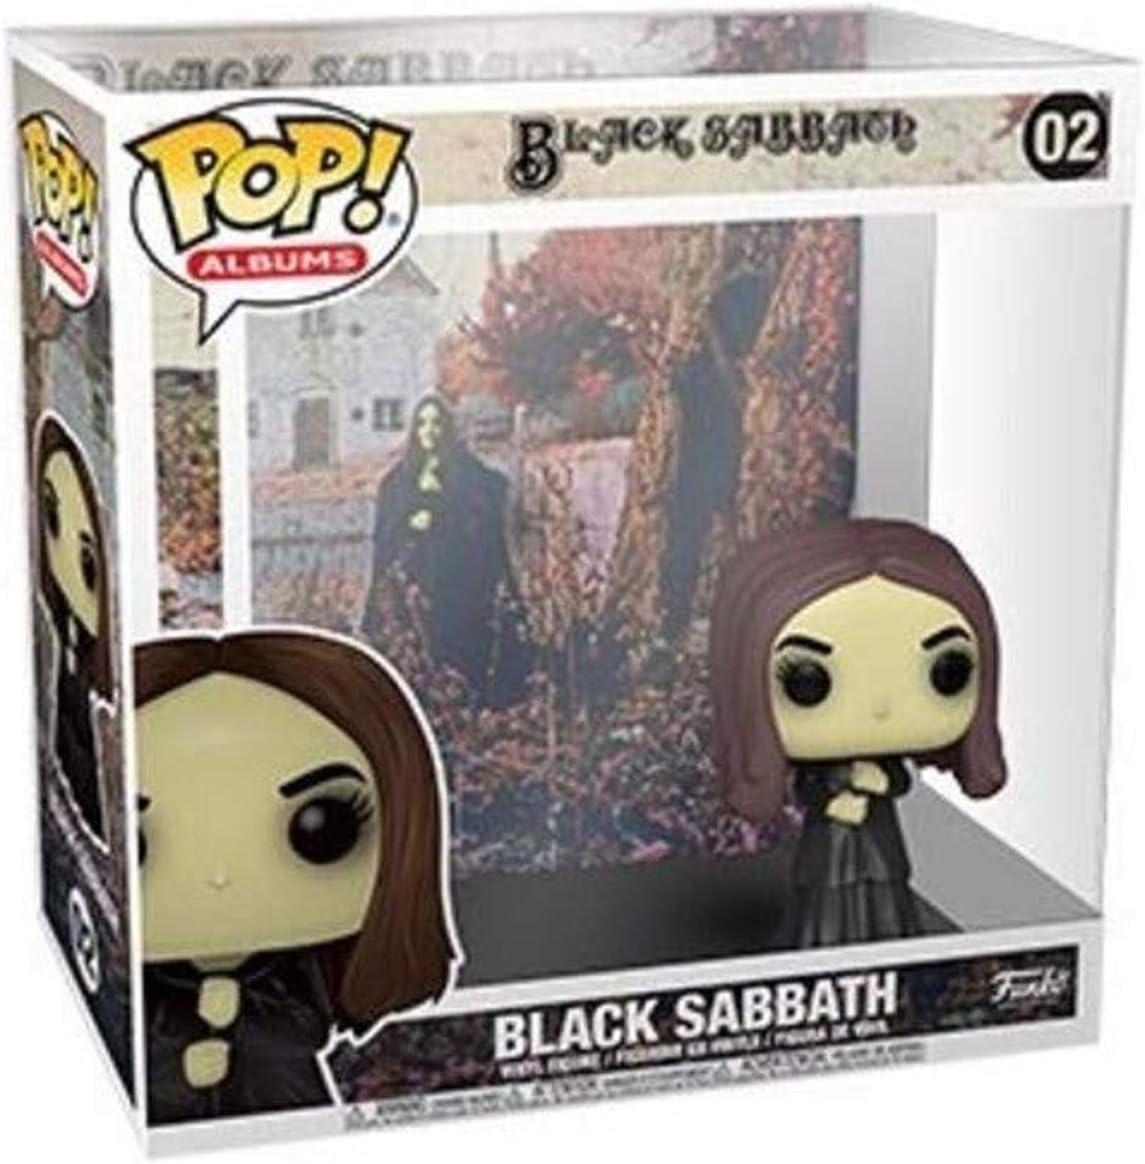 Amazon.com: Funko Pop! Álbumes: Black Sabbath - Black Sabbath: Toys & Games